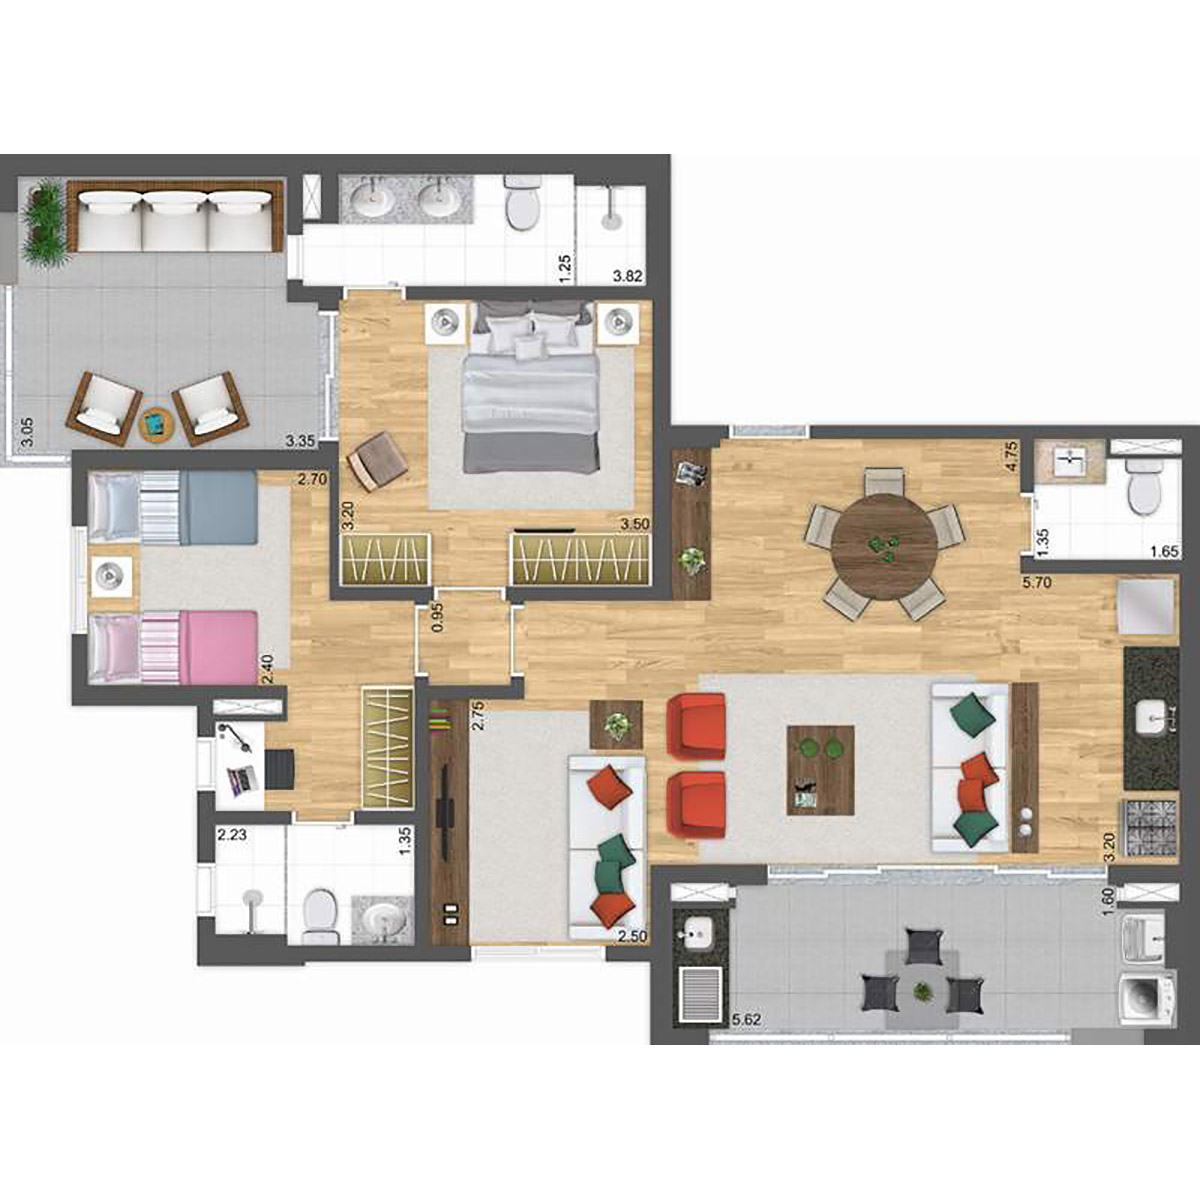 Cobertura de 97 m² - 3 suites Parway Panamby